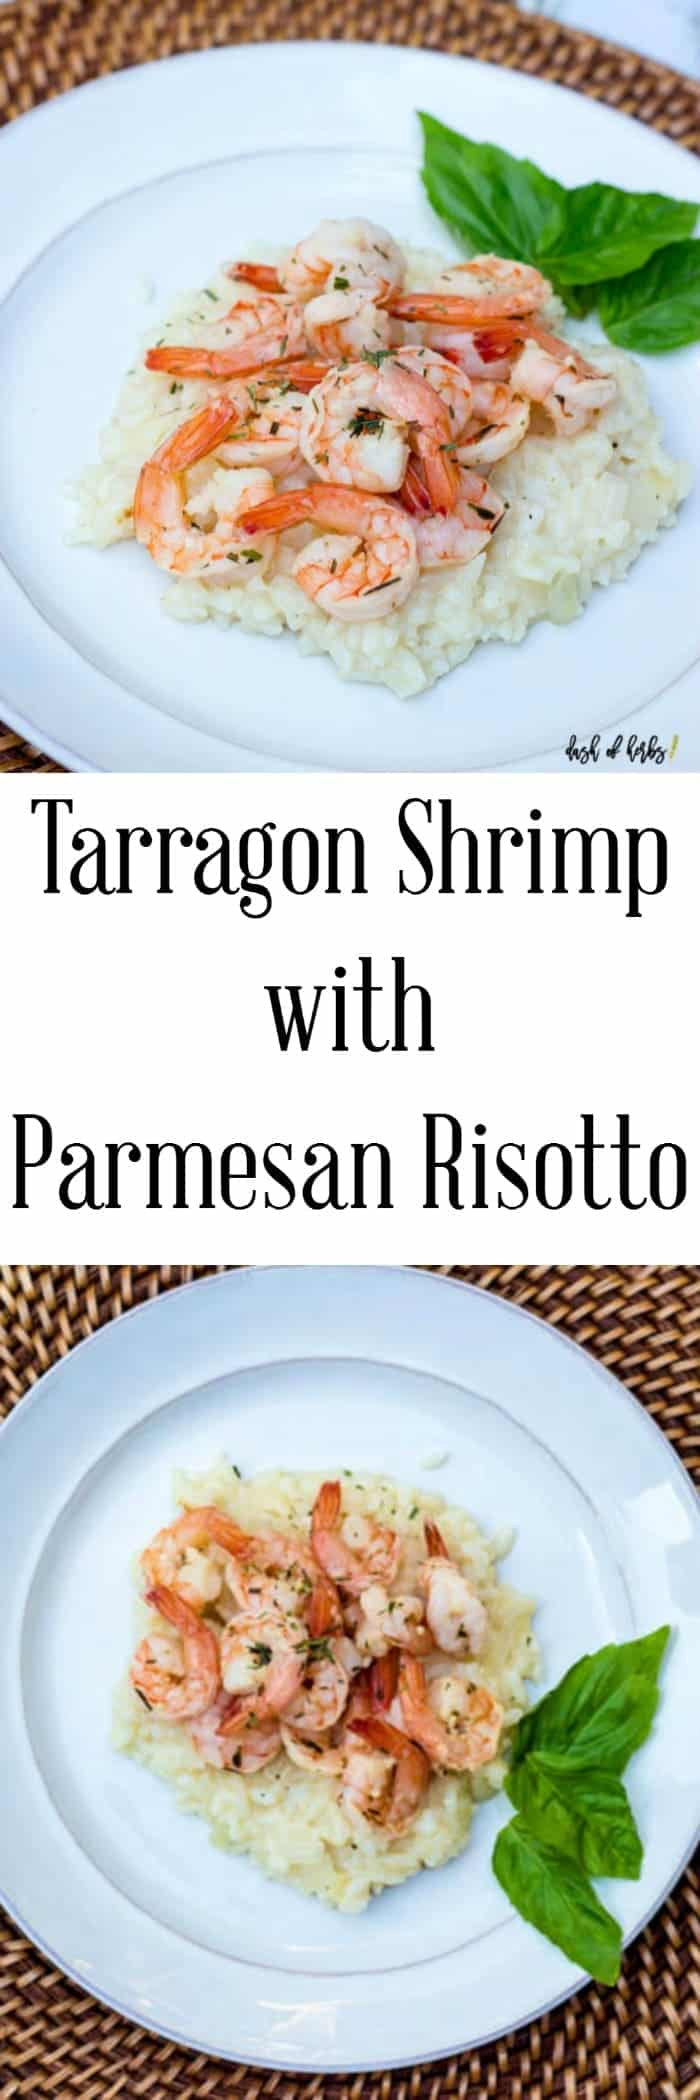 tarragon-shrimp-with-parmesan-risotto